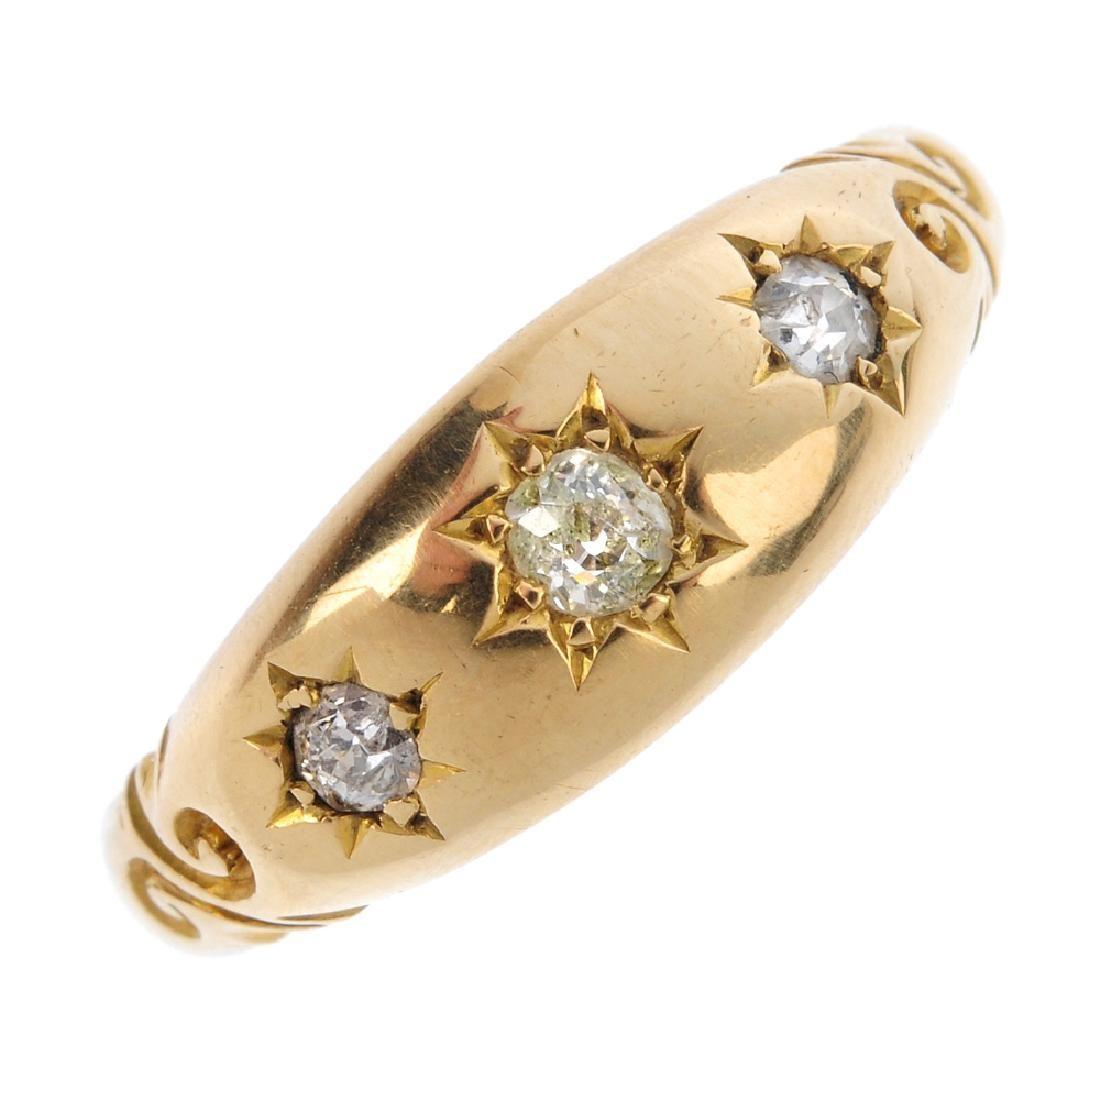 An early 20th century 18ct gold diamond three-stone